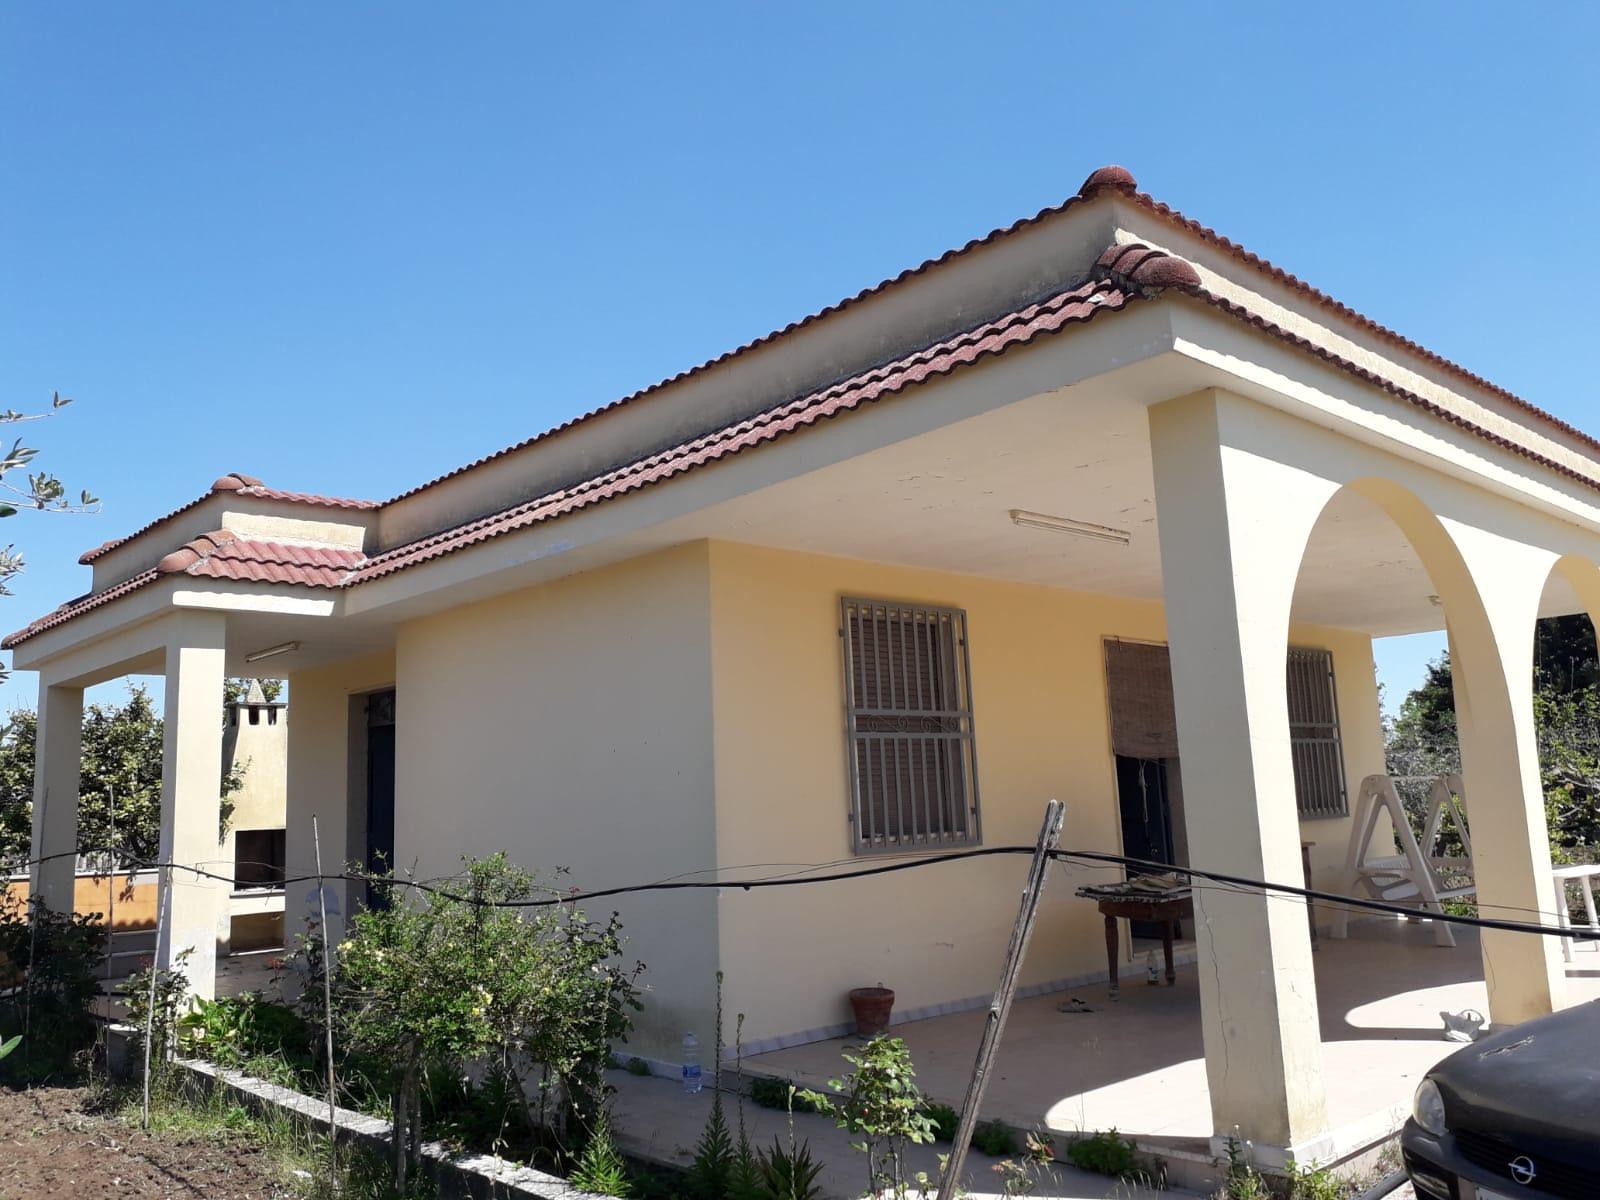 Casa di campagna in vendita a Francavilla Fontana, con ...